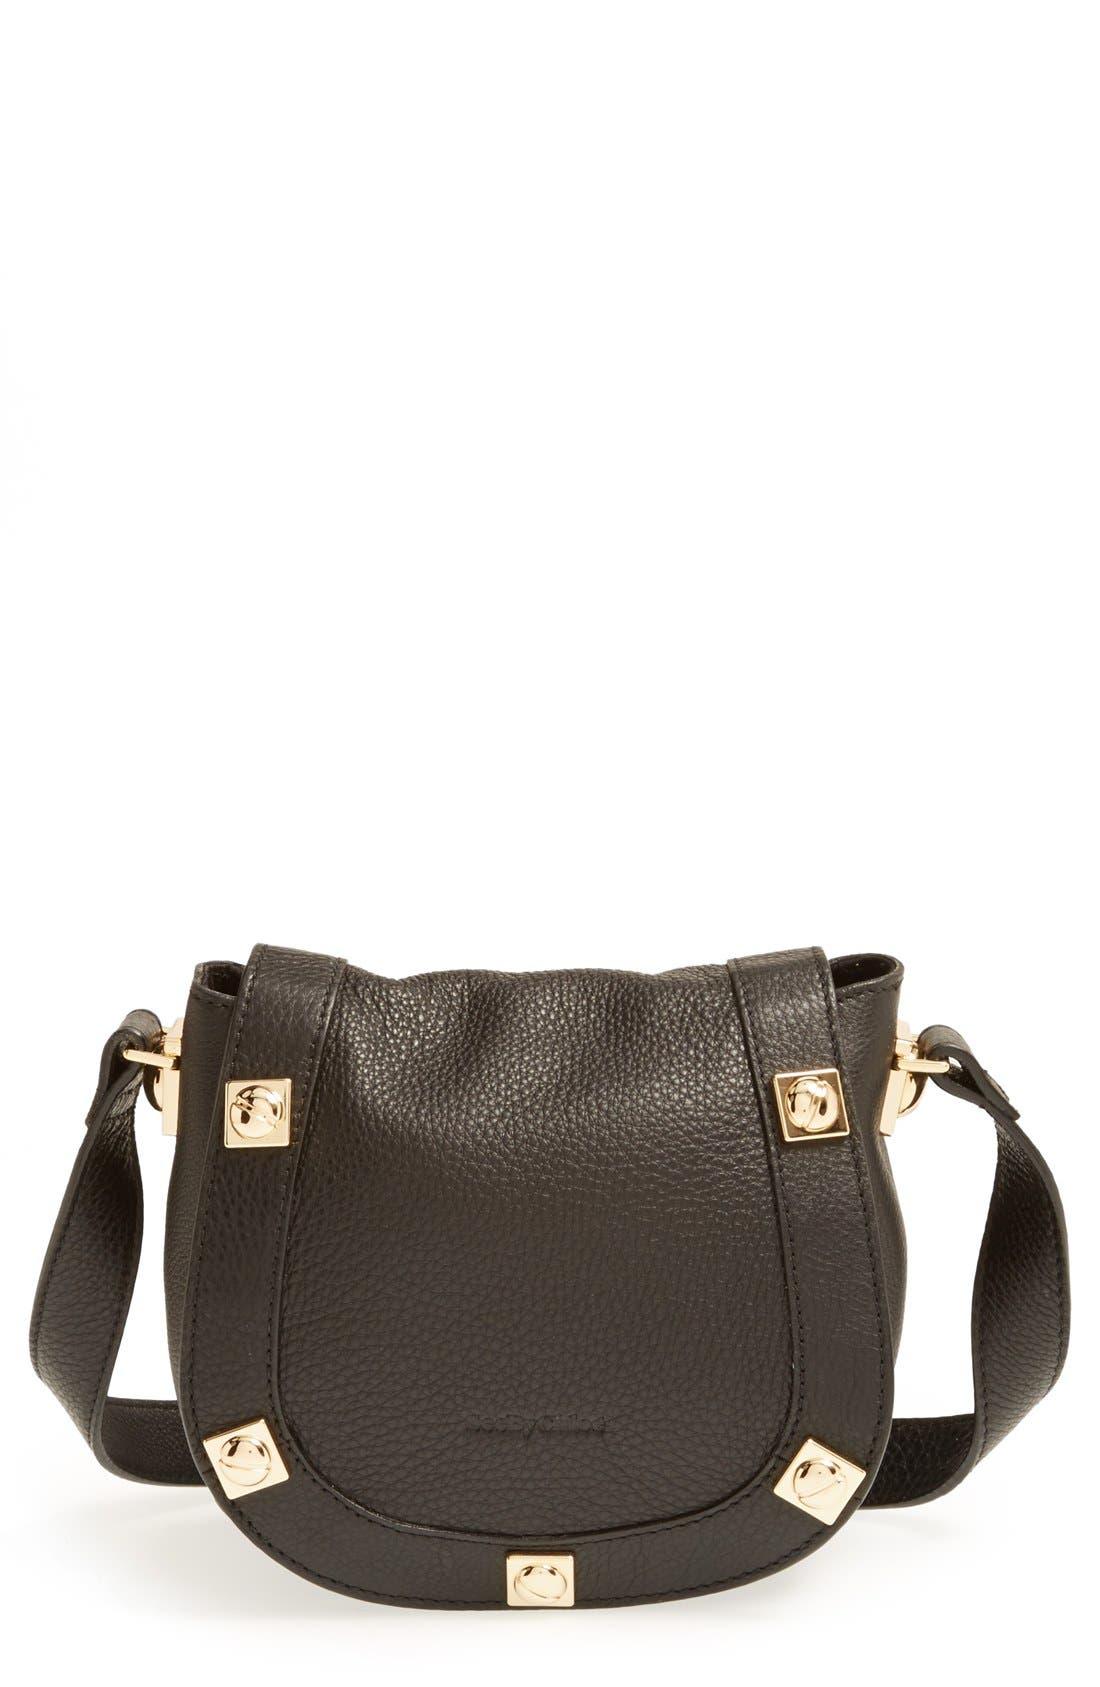 'Mini Sadie' Leather Crossbody Bag,                             Main thumbnail 1, color,                             001